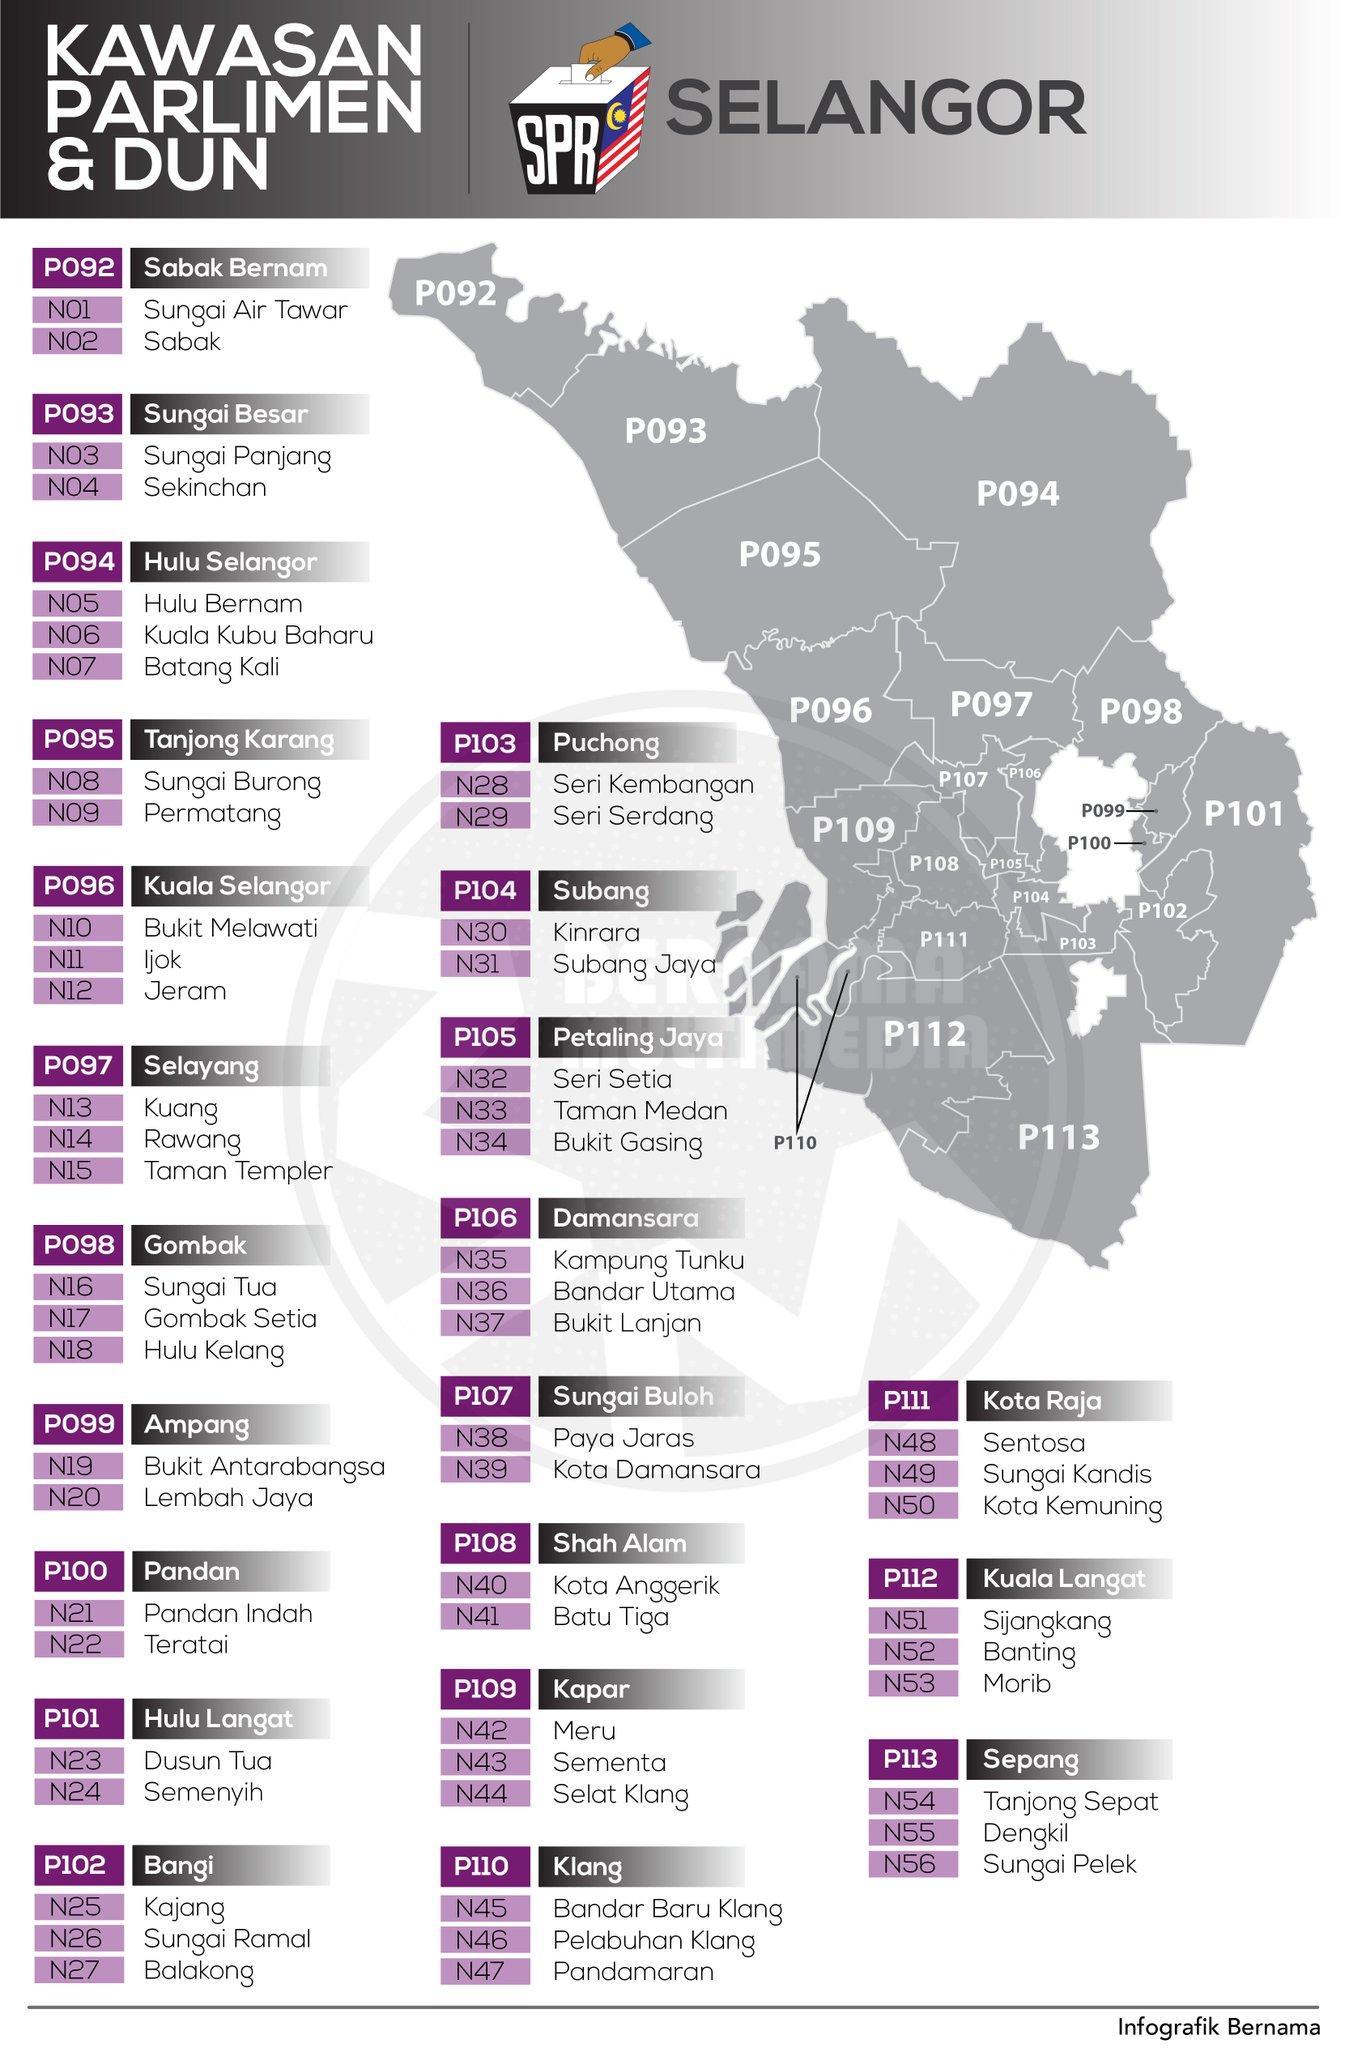 Bernama Twitterissa Infografik Kawasan Parlimen Dan Dun Selangor Jomkitasemak Jomkitaundi Undiandapenentumasadepannegara